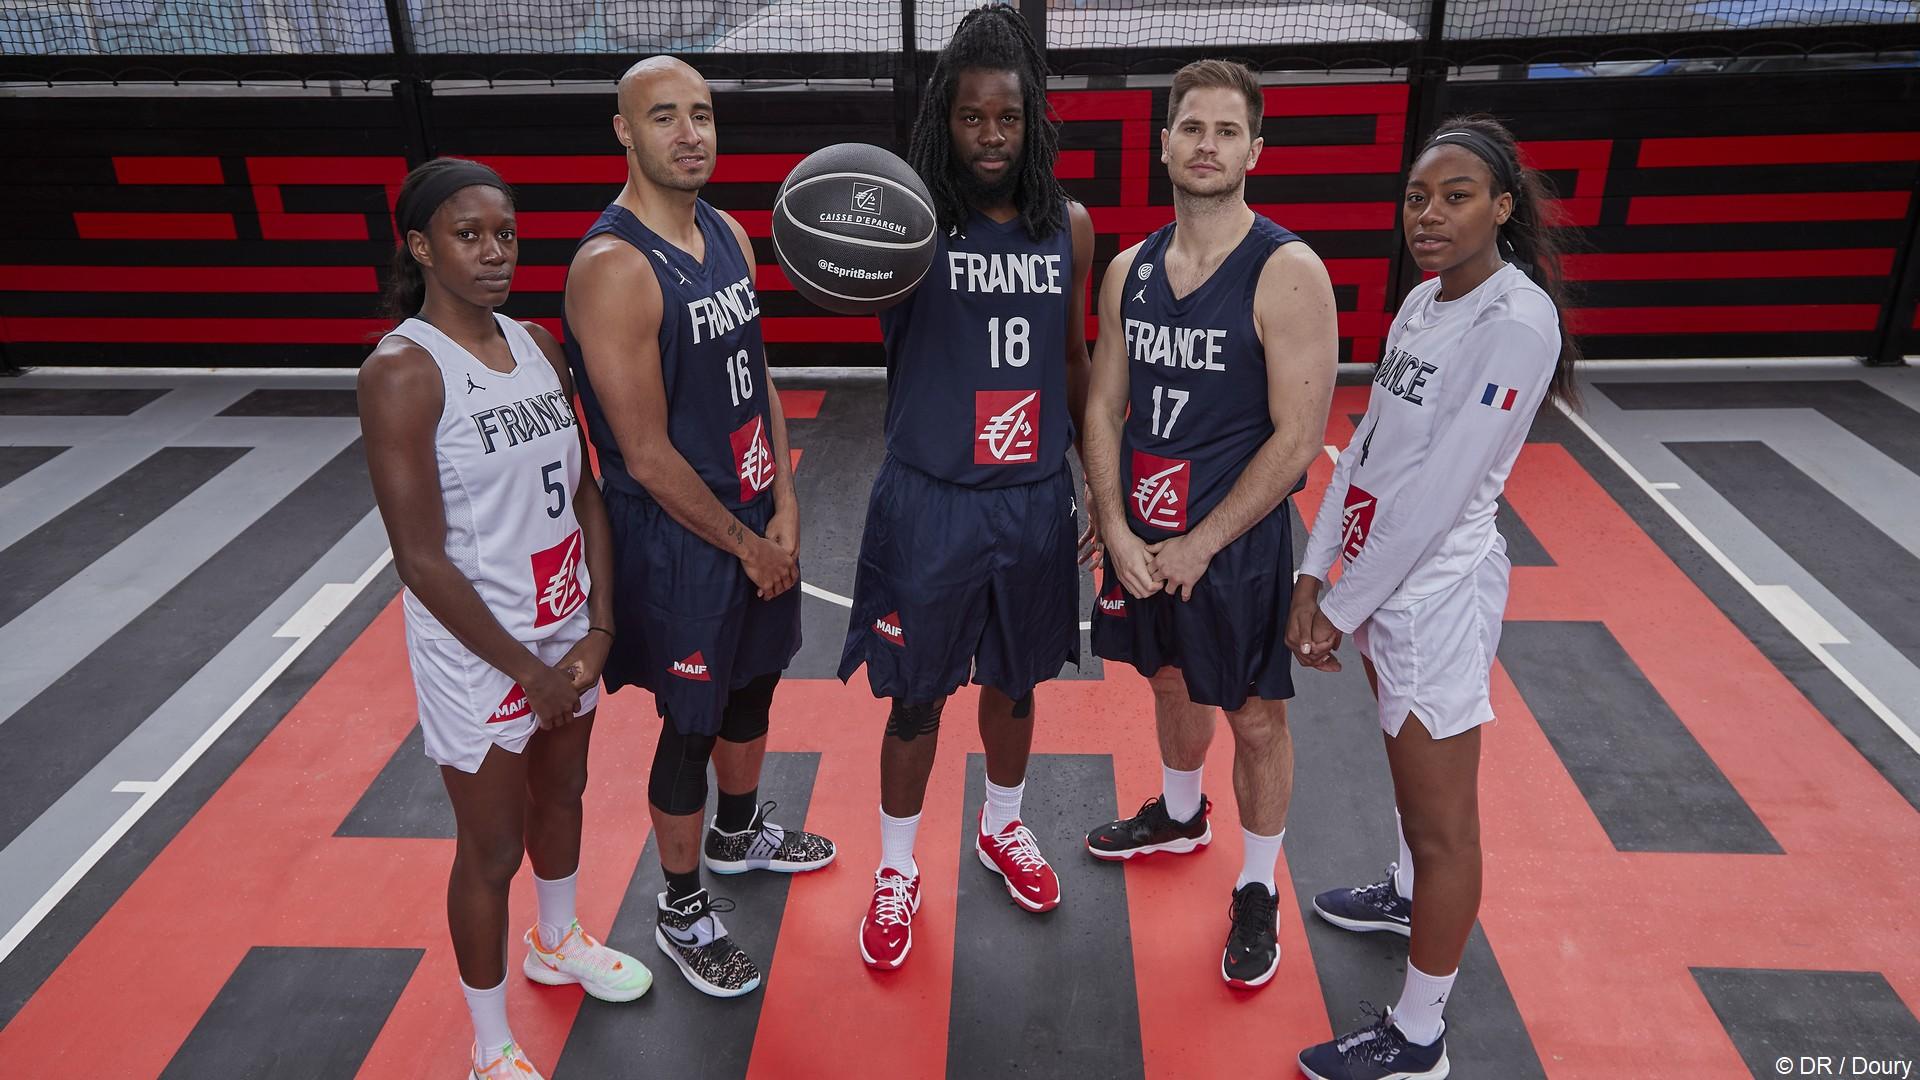 Caisse d'Epargne x Basket (basket) 2021